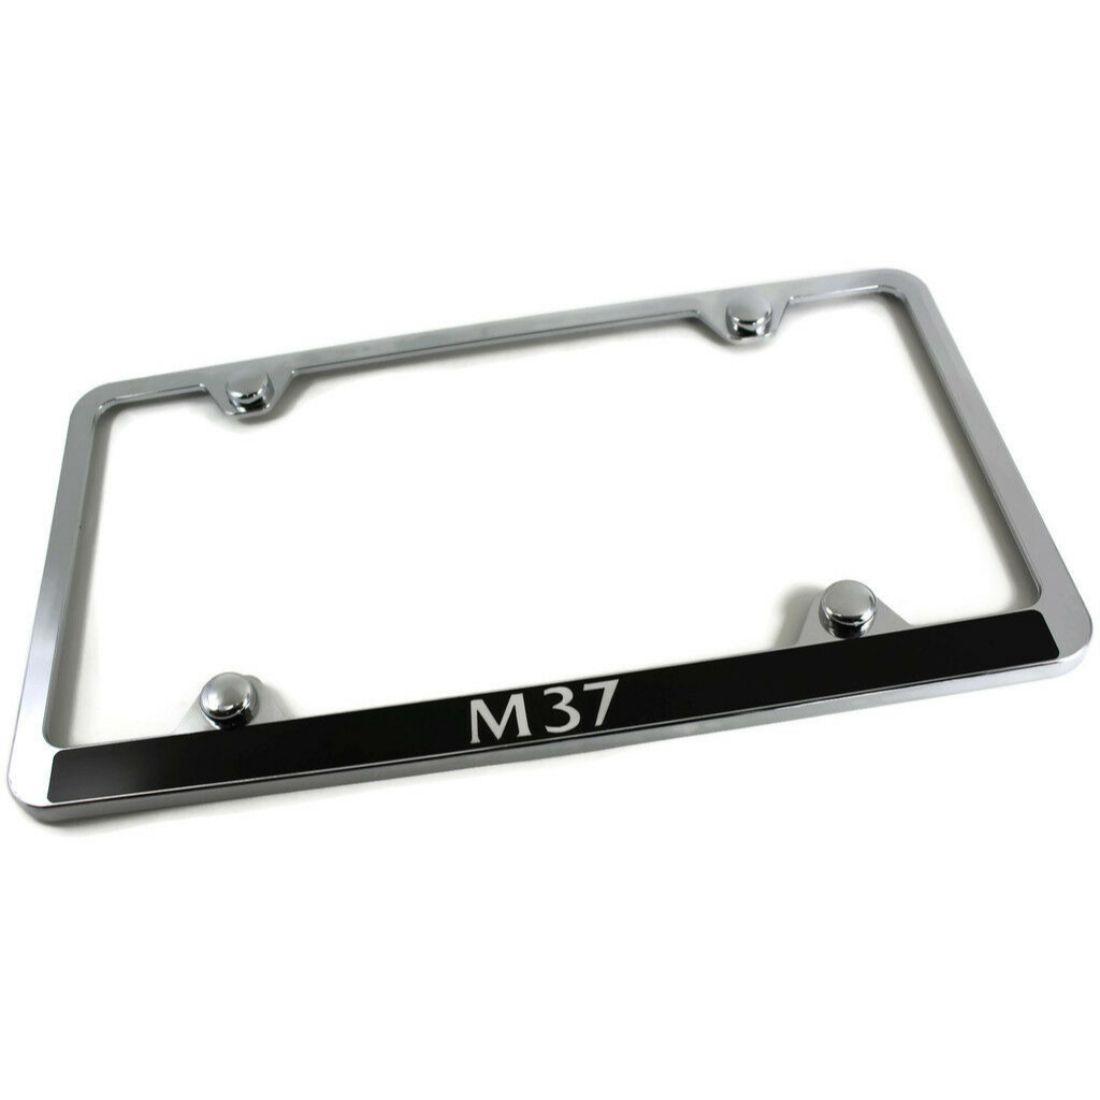 Infiniti M35x Slim ABS Plastic License Plate Tag Frame Mirror Chrome Screw Cap